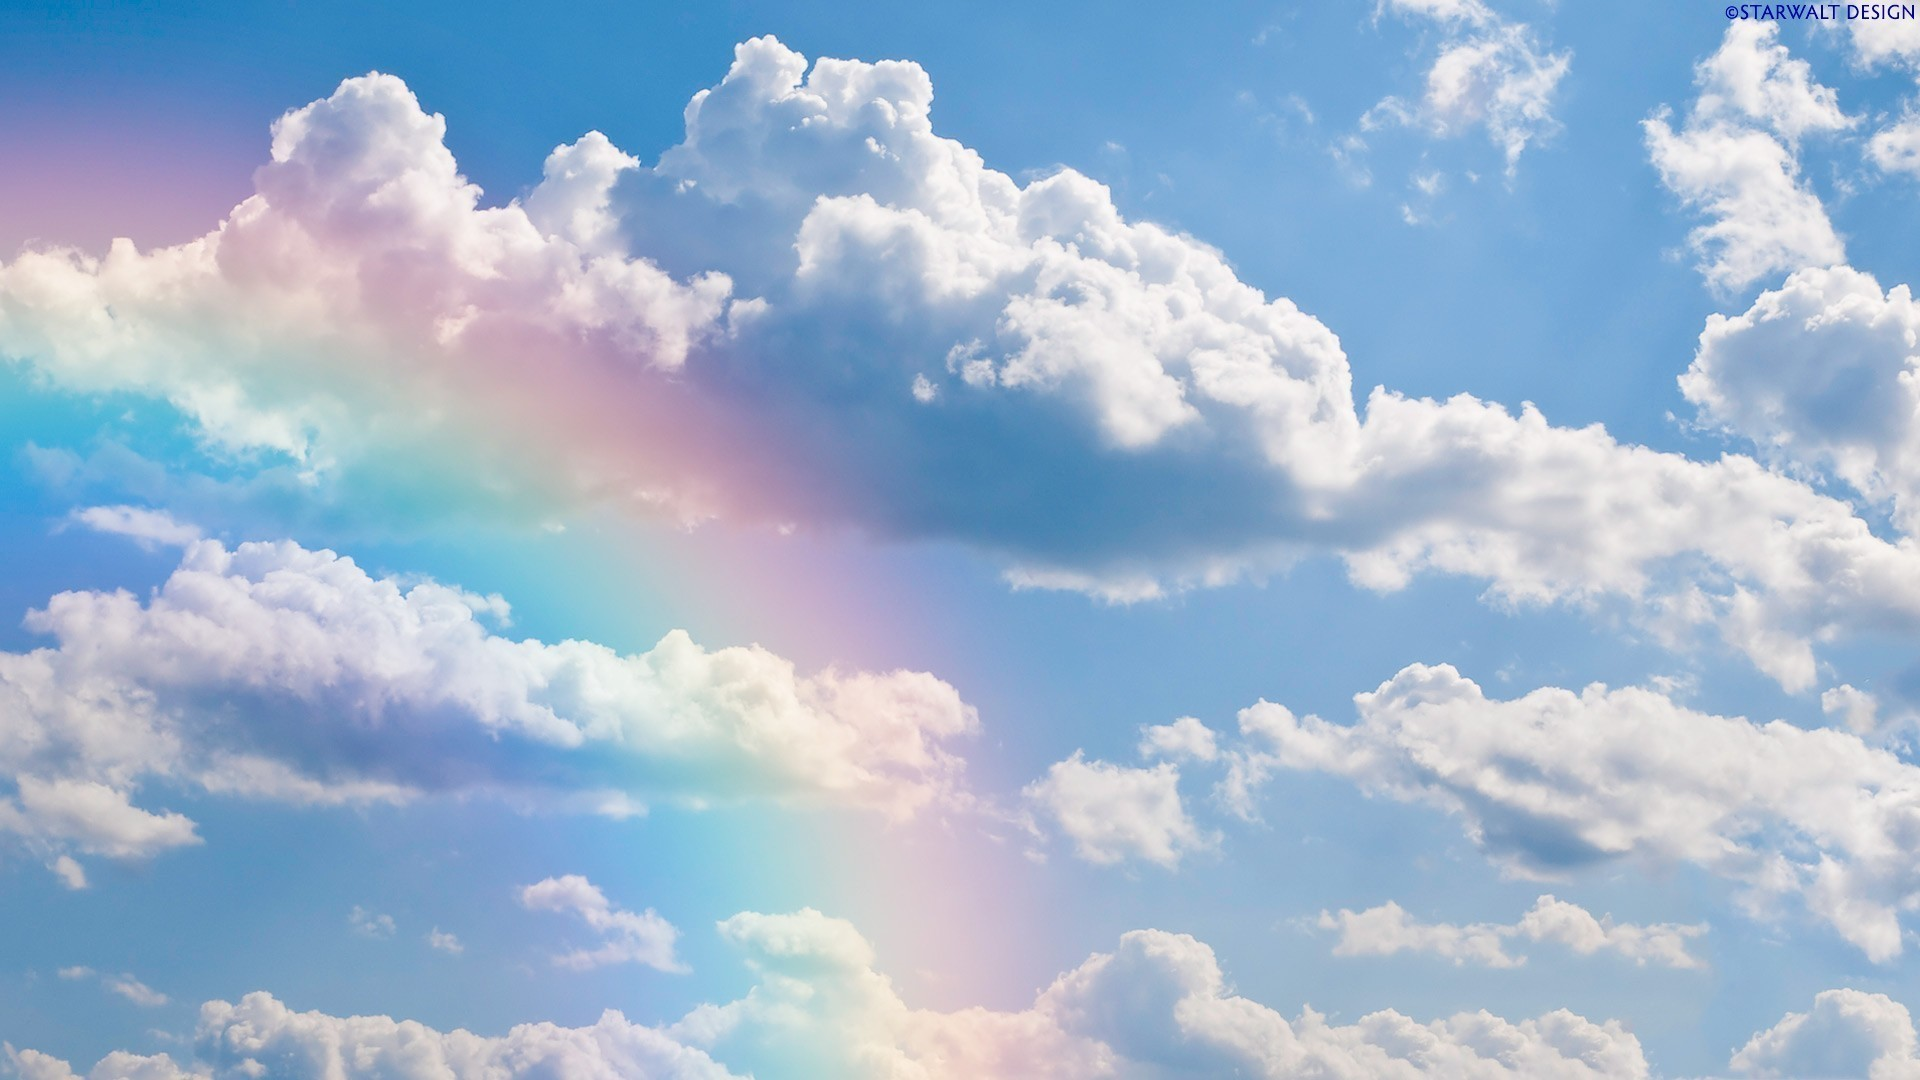 fondos nubes adnfriki (1)